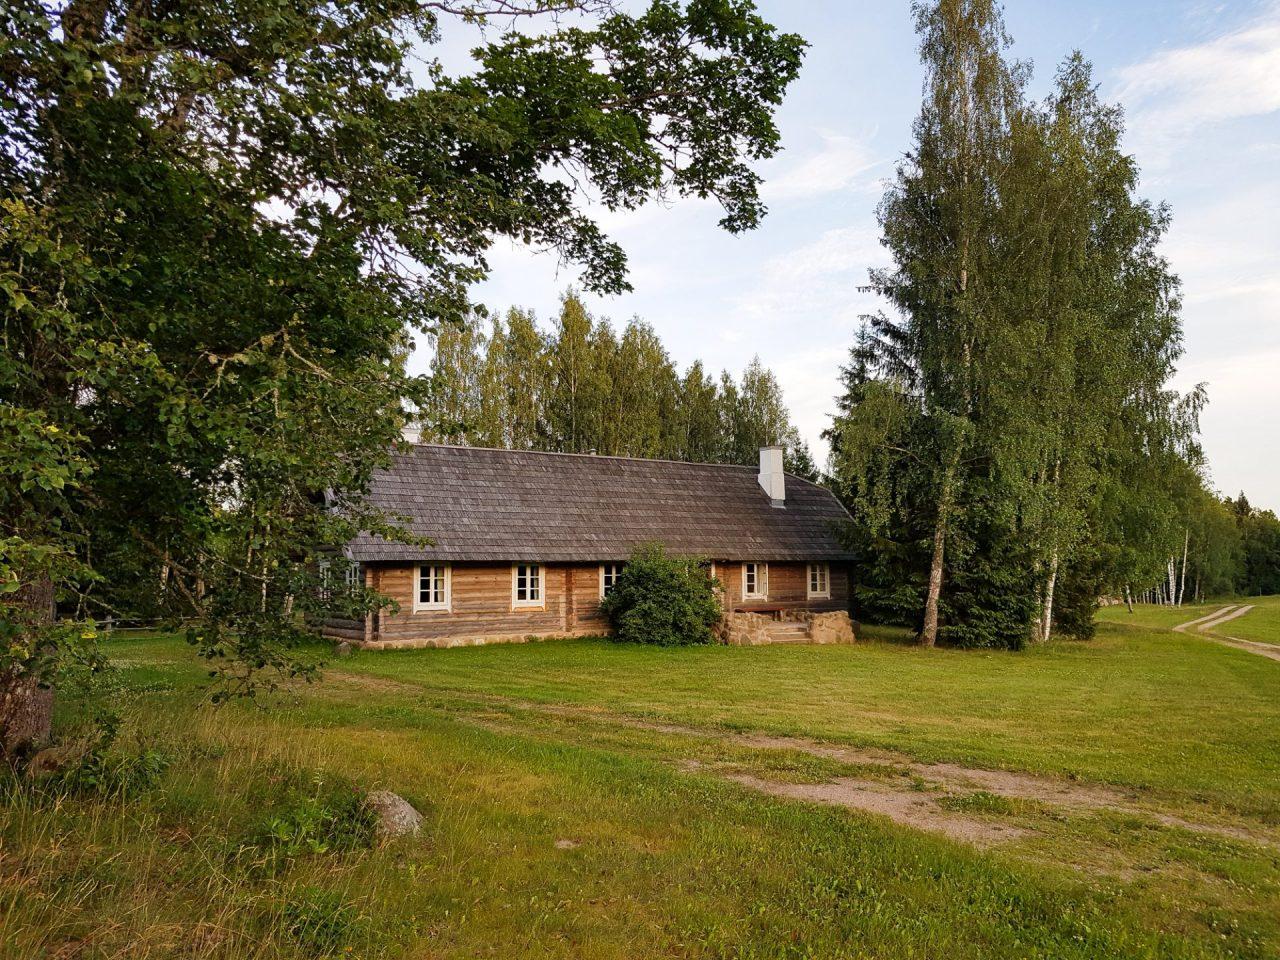 lituanie-parc-national-aukstaitija-miskikinises-gite-rural-cabane-rondins